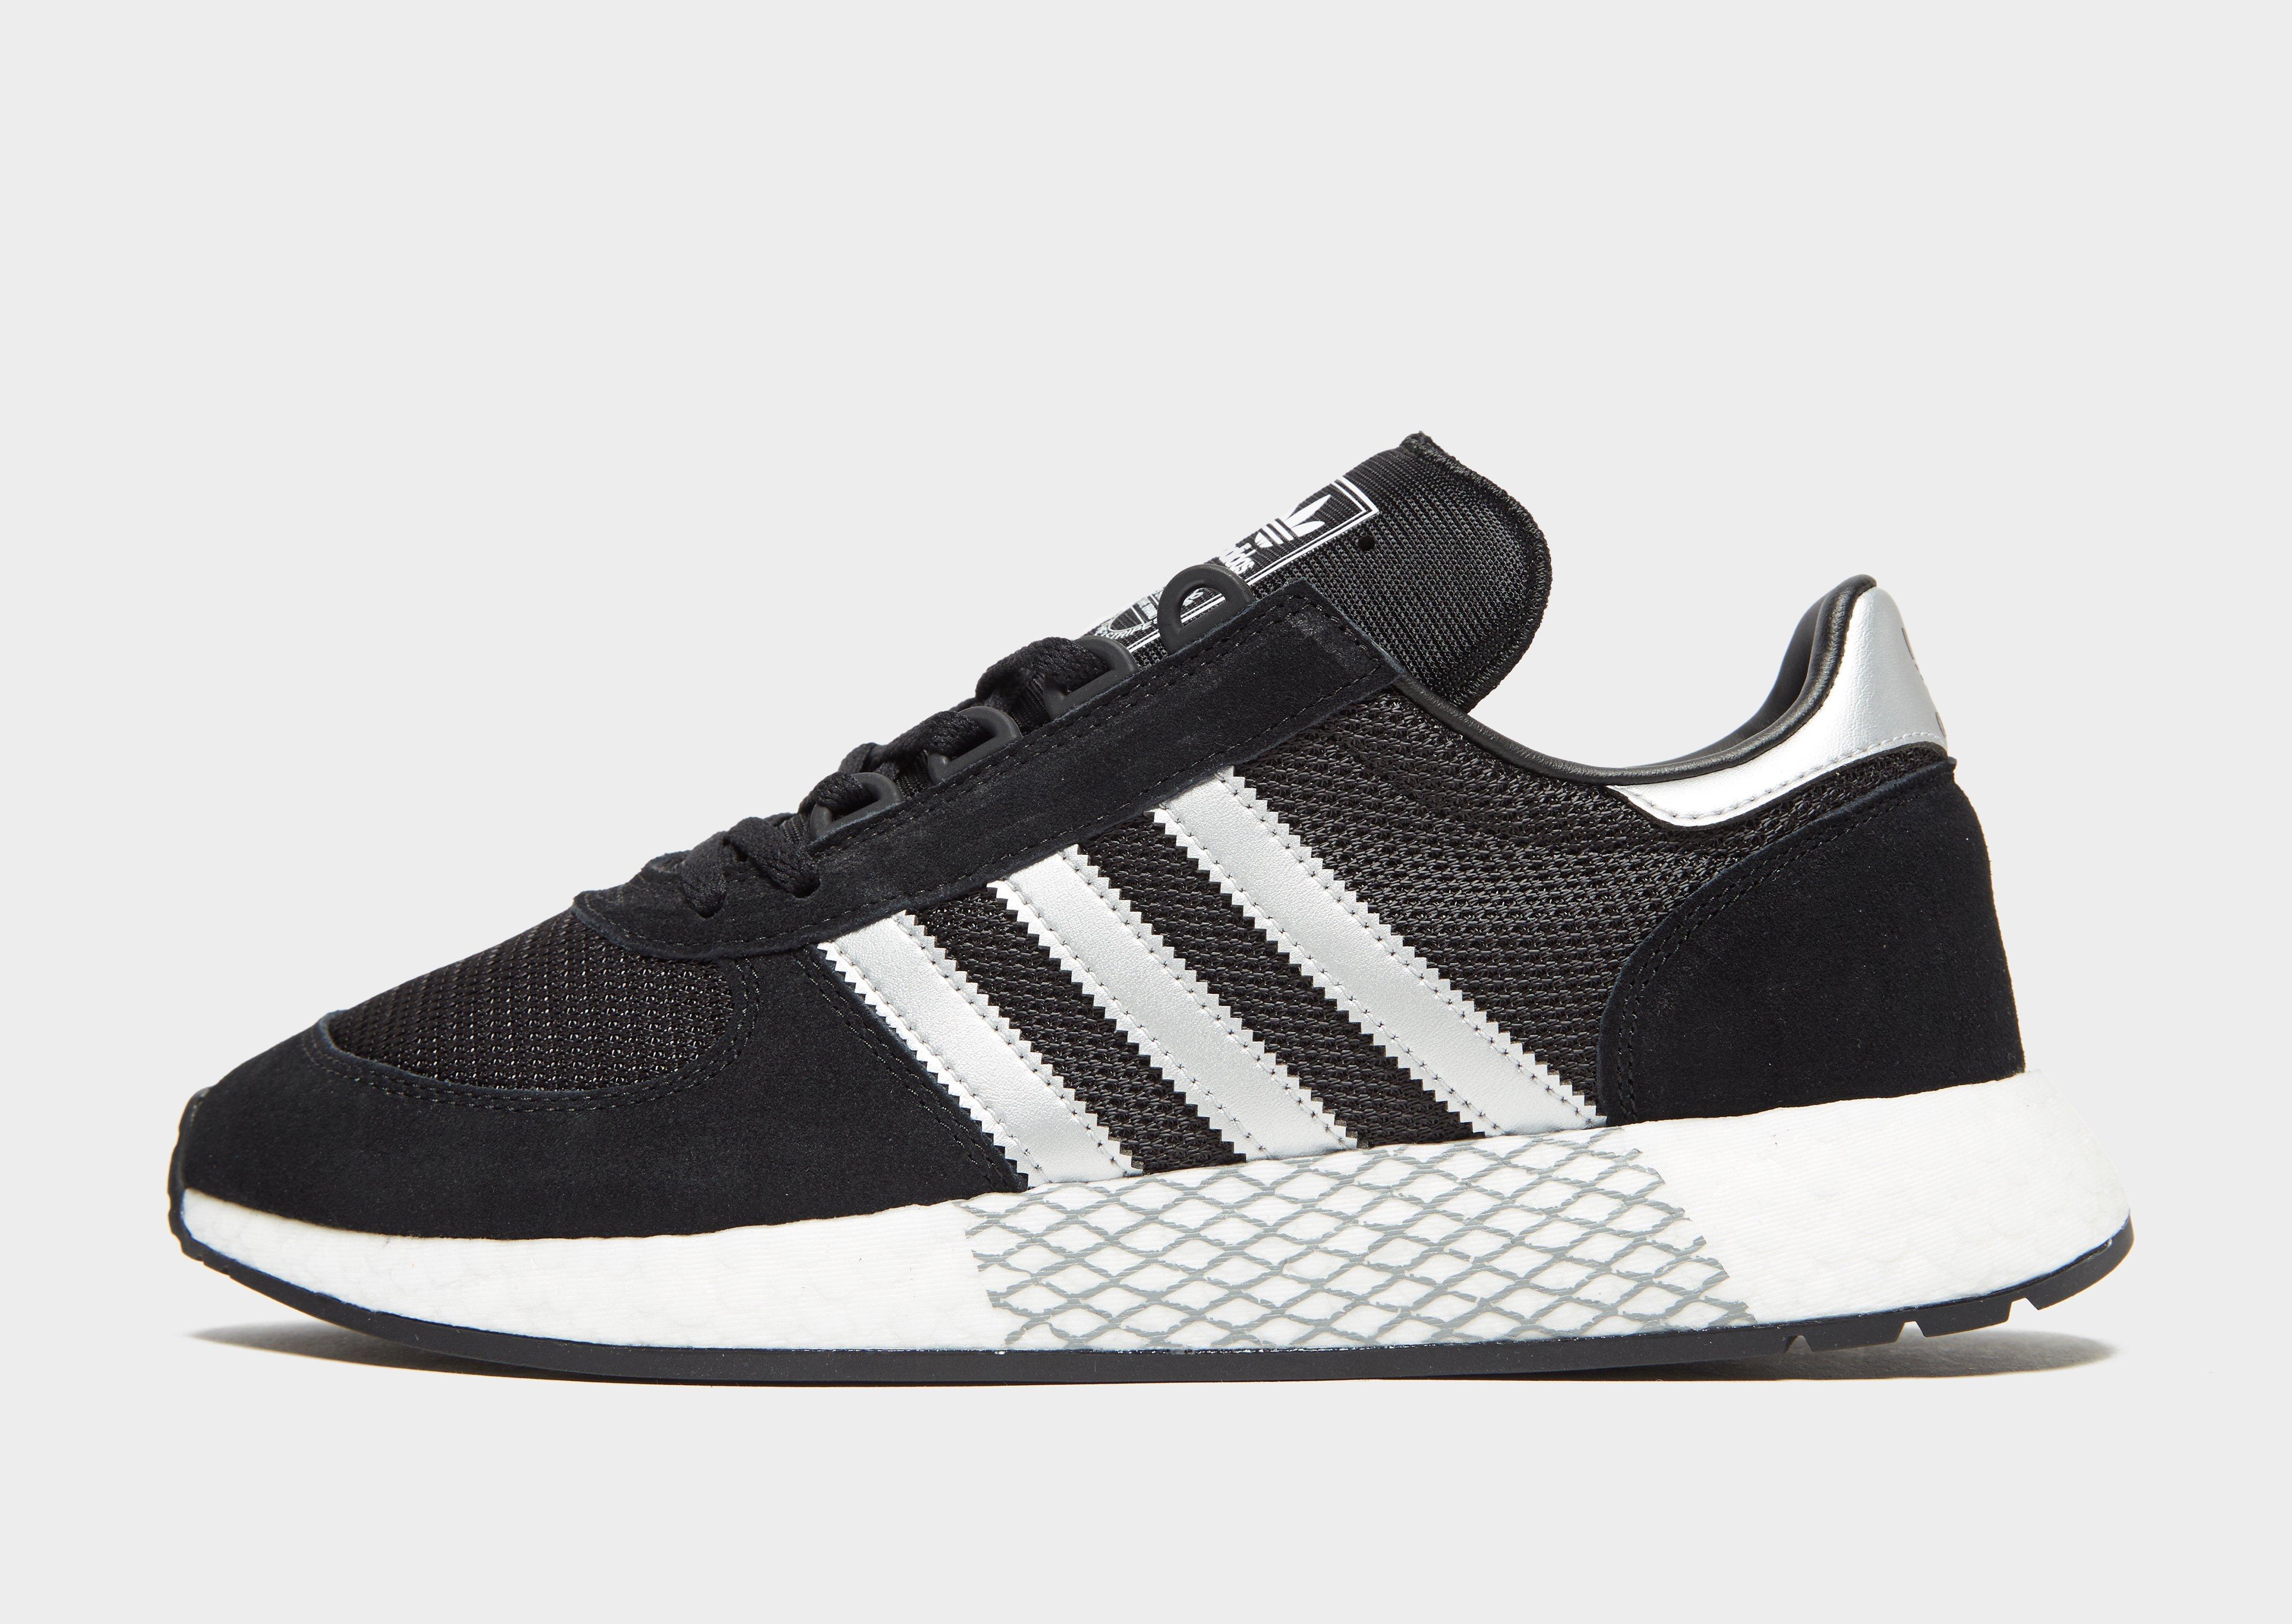 7e75d83d4ad5 Lyst - adidas Originals Marathon Boost in Black for Men